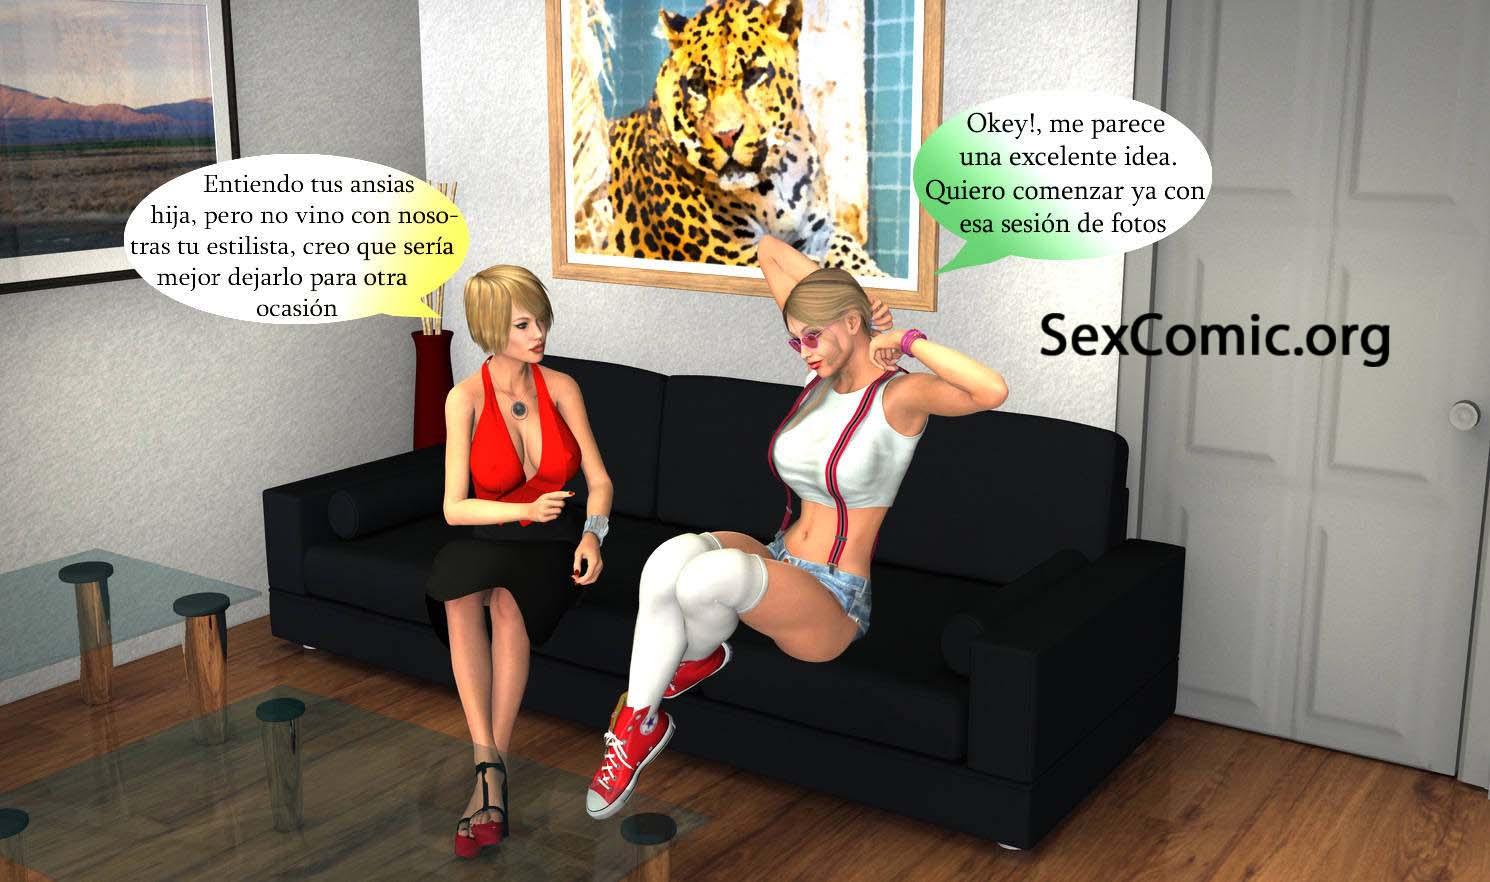 comic-xxx-3d-seduciendo-alas-empleadas-de-mama-historias-sexuales-mangas-para-adultos-videos-deincesto-comics-xxx-historias-eroticas-fantacias-sexuales-gtaris-online-61